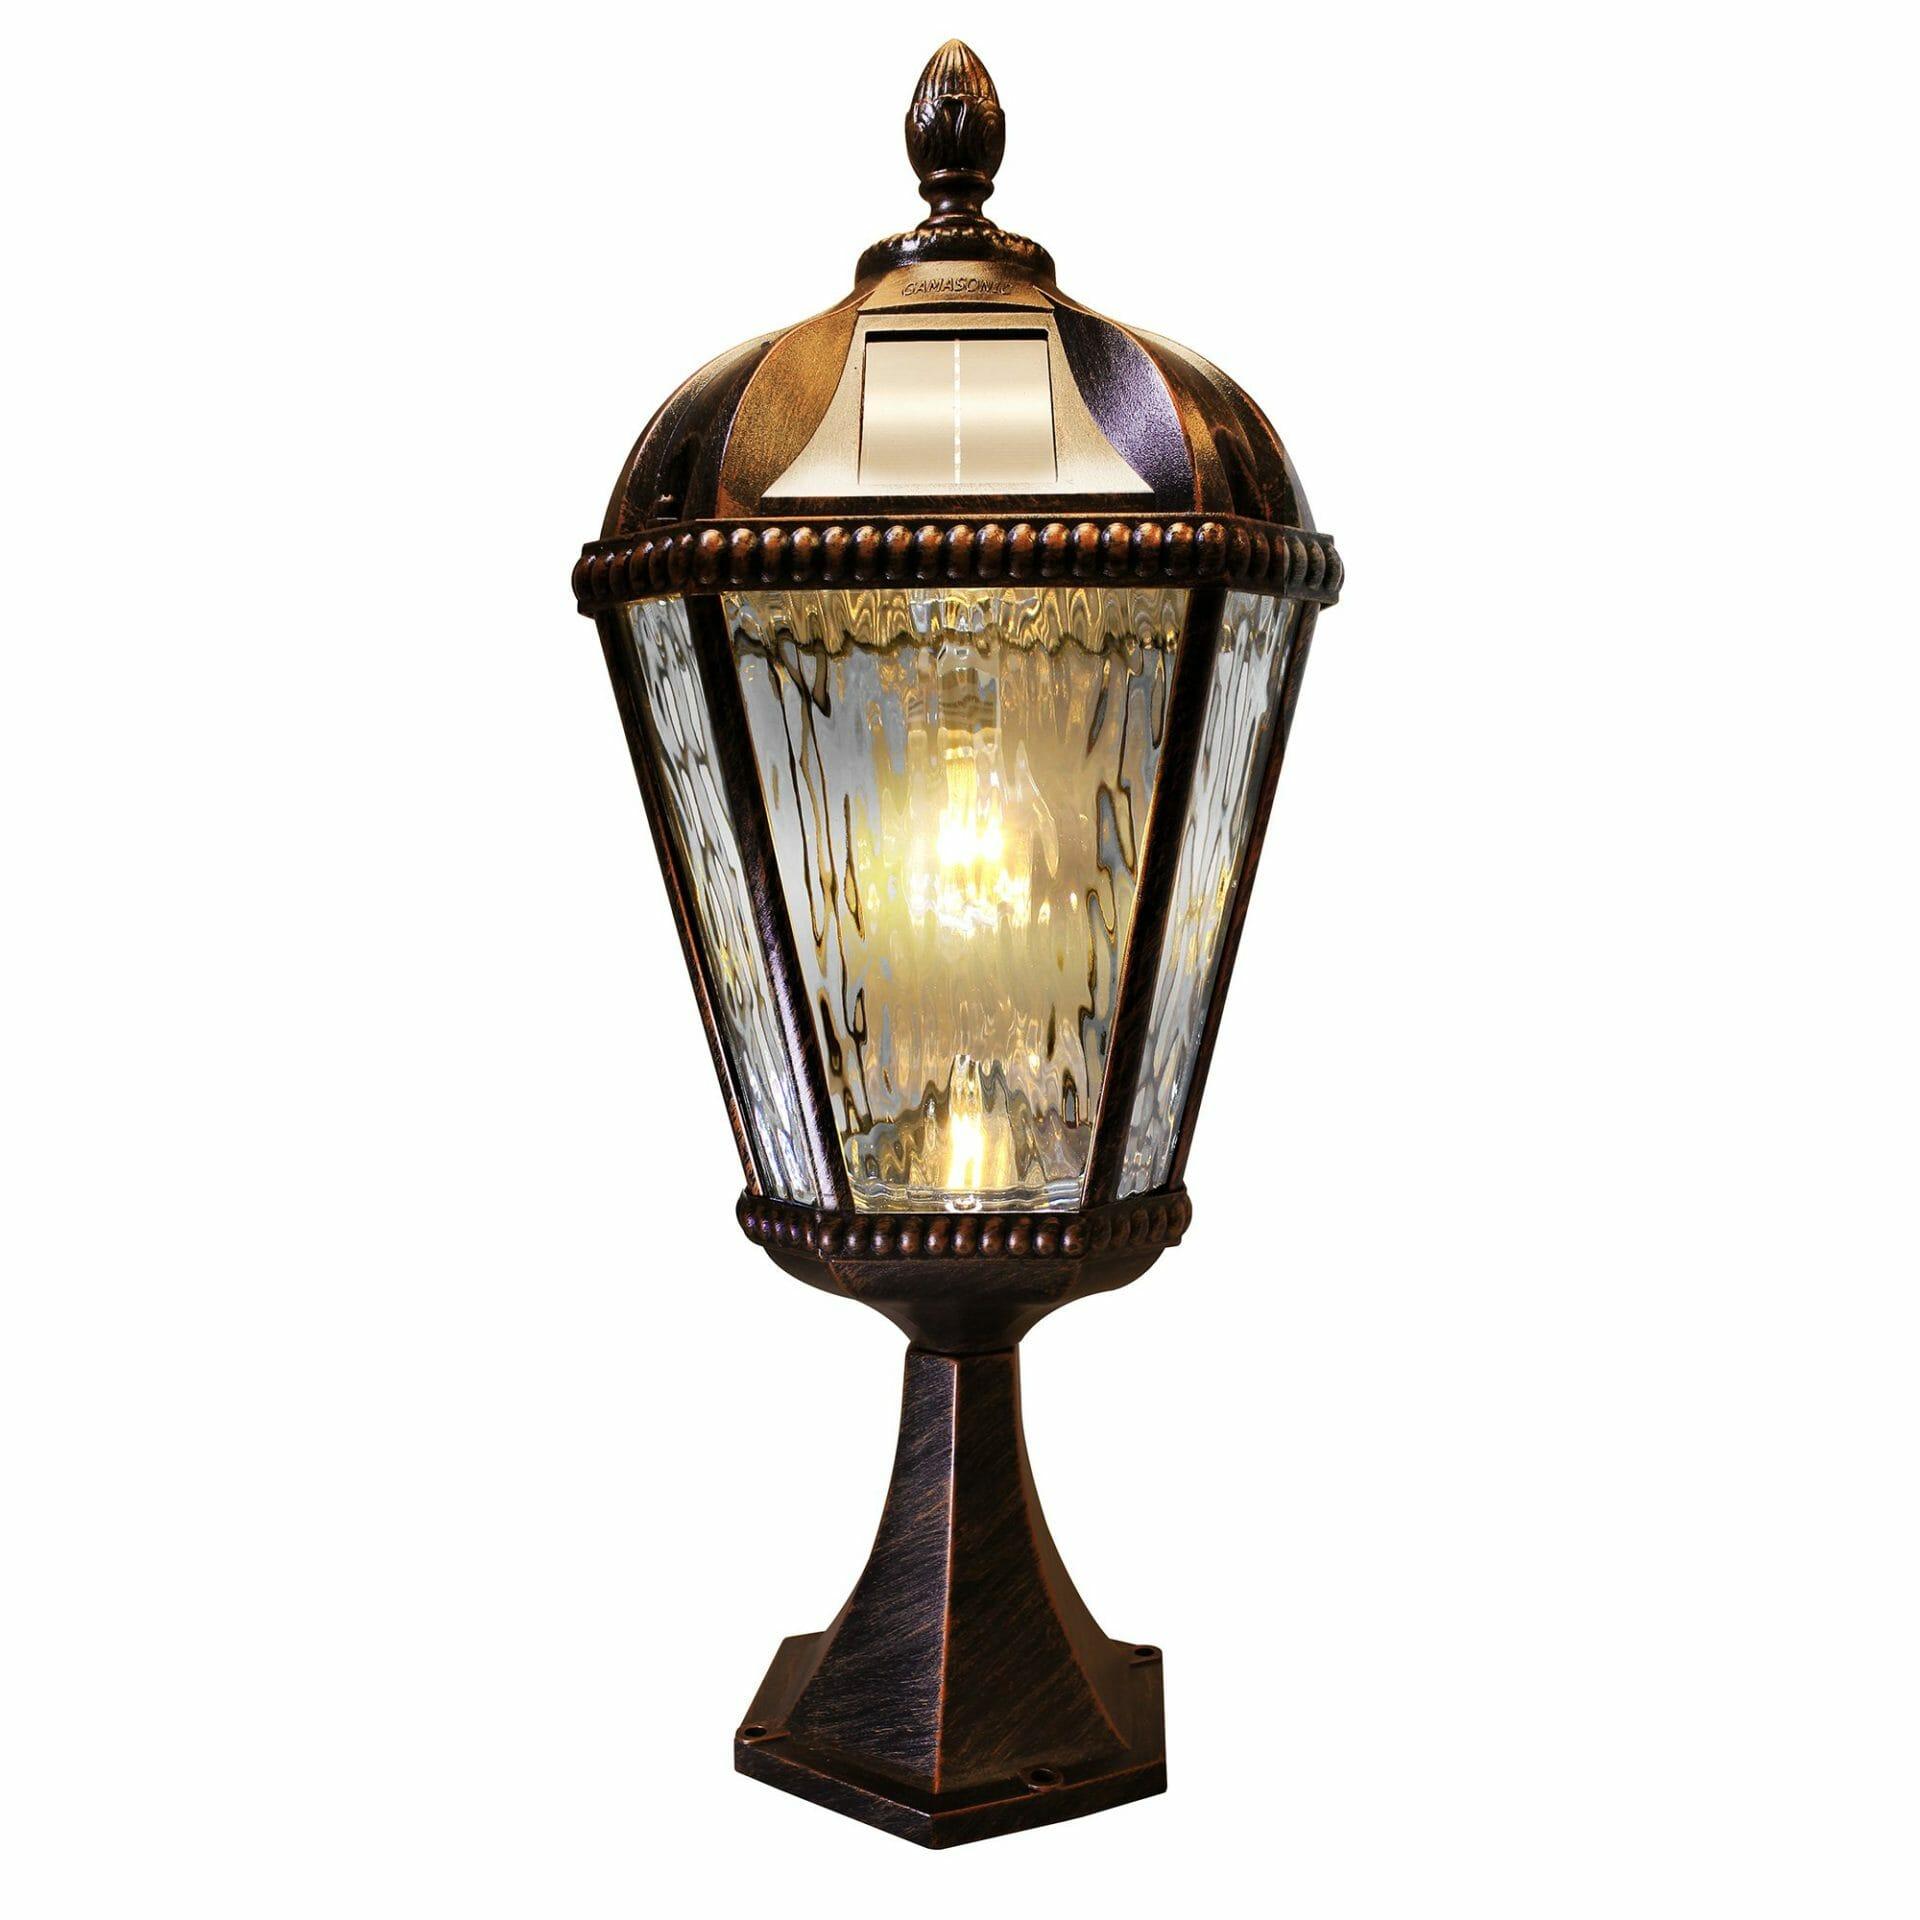 Royal Bulb Pier Mount Solar Lamp - 98B111